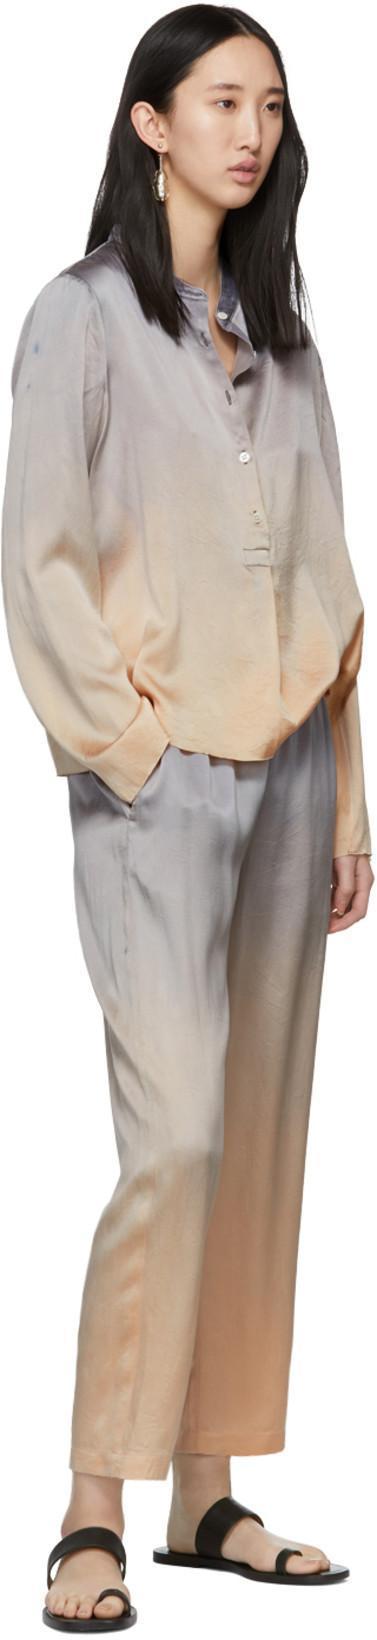 4801a4cce4695b RAQUEL ALLEGRA Raquel Allegra Silver Tie-Dye Silk Shirt in Silvertiedy